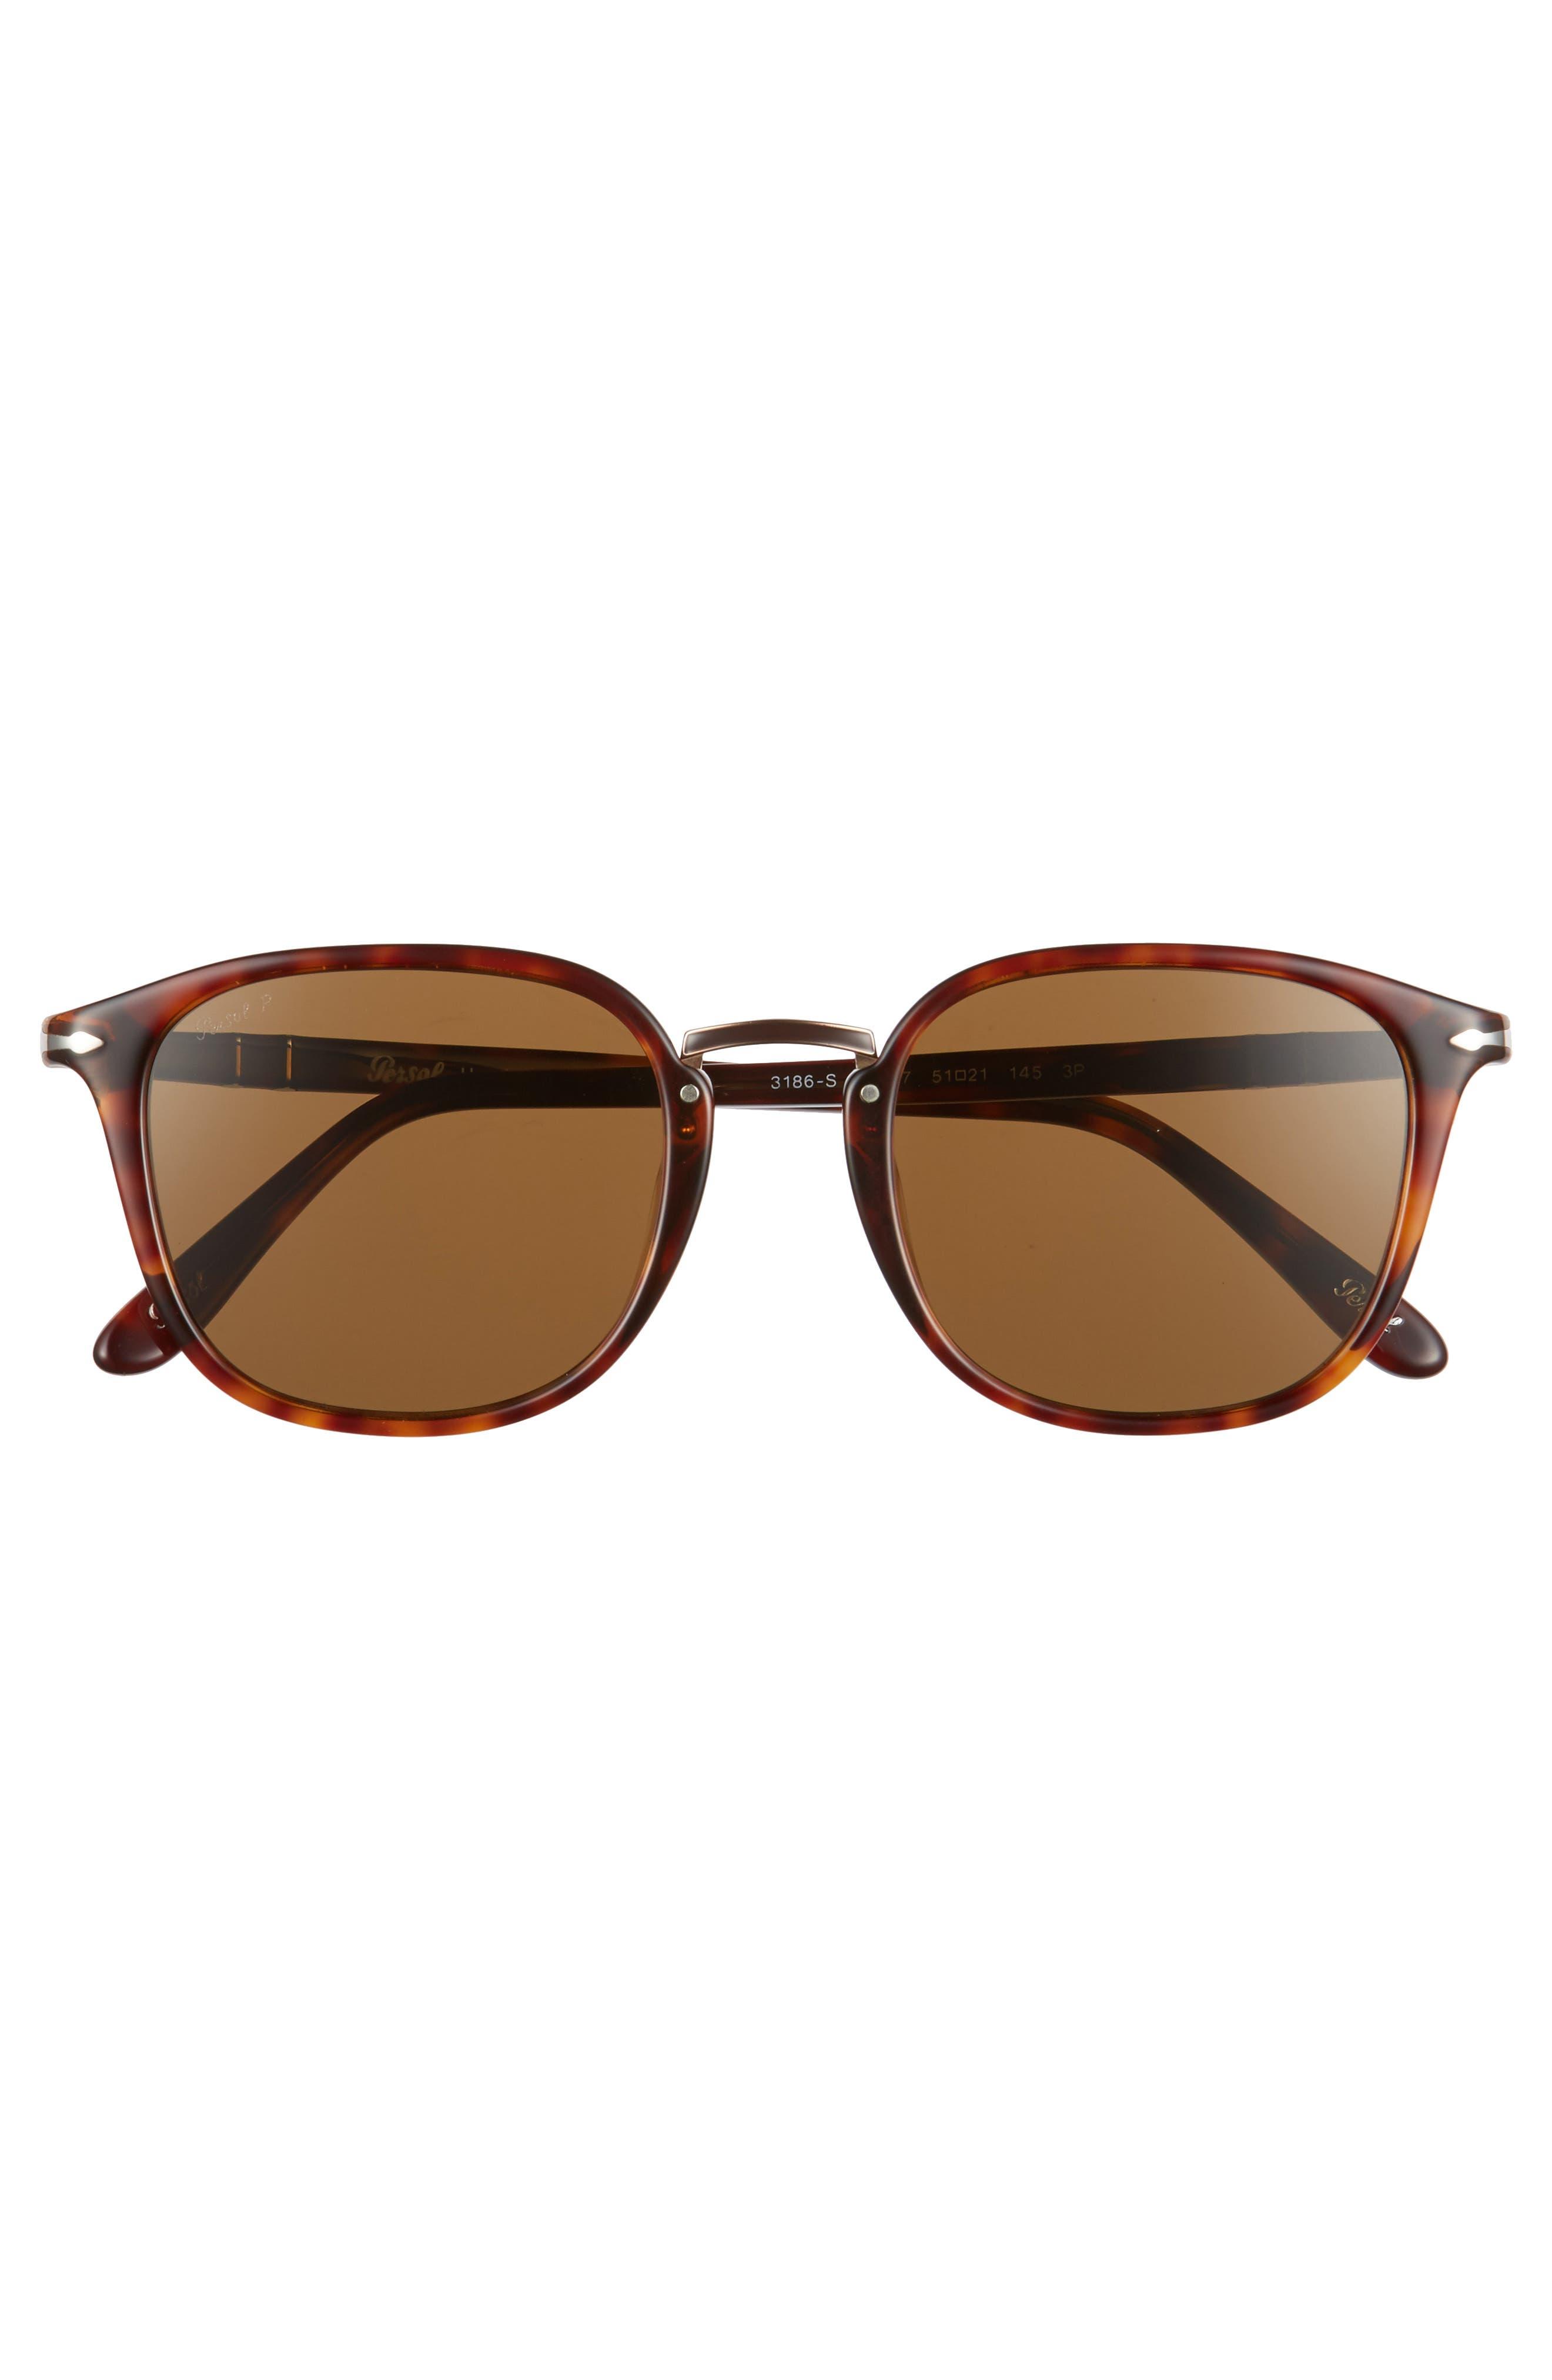 Phantos 51mm Polarized Sunglasses,                             Alternate thumbnail 2, color,                             234